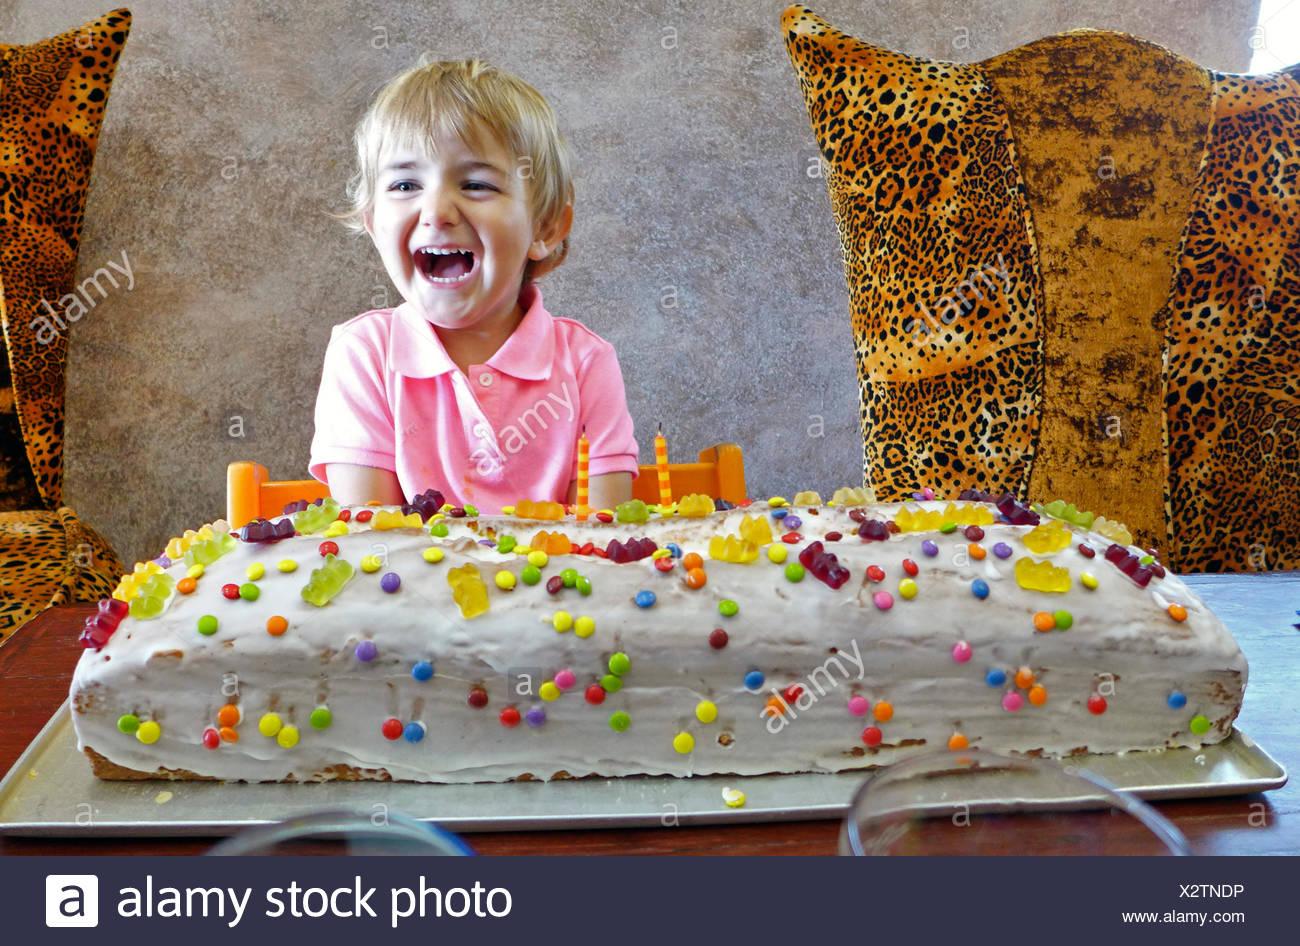 Little Boy With Giant Birthday Cake Stock Photo 277138898 Alamy